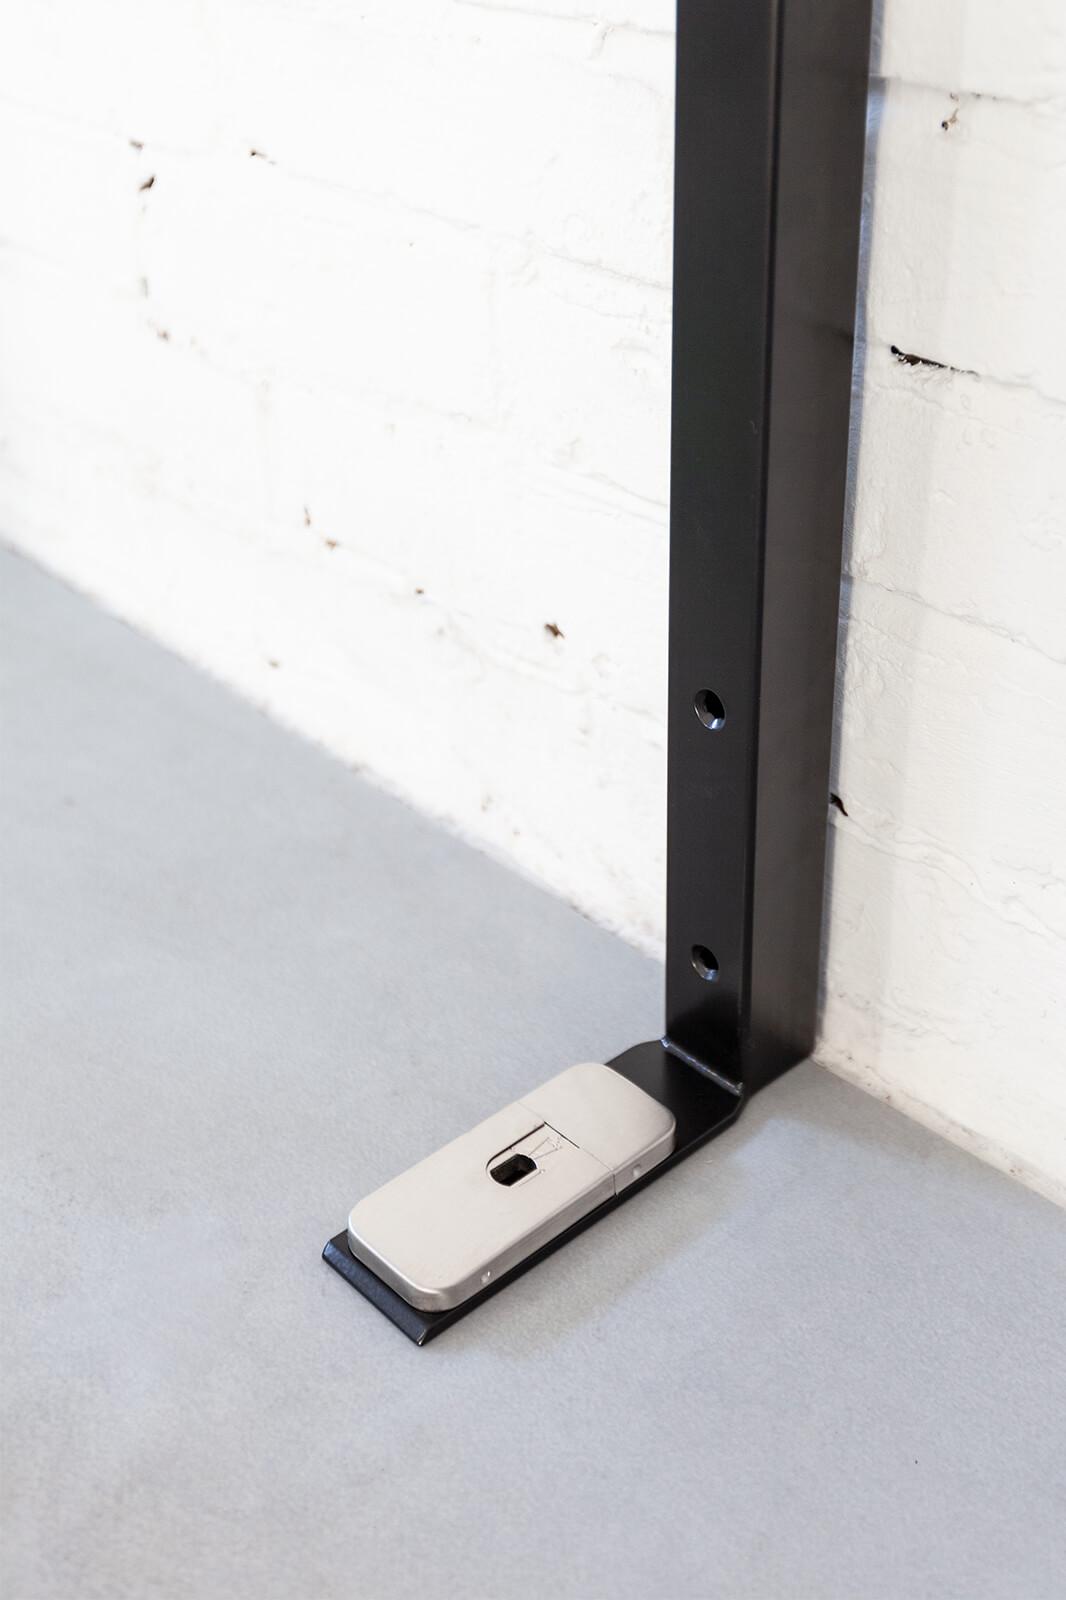 N51E12 - Pivot - Schwingtür - Bodenaufnahme - Bodenelement - 4-Kant-Zarge